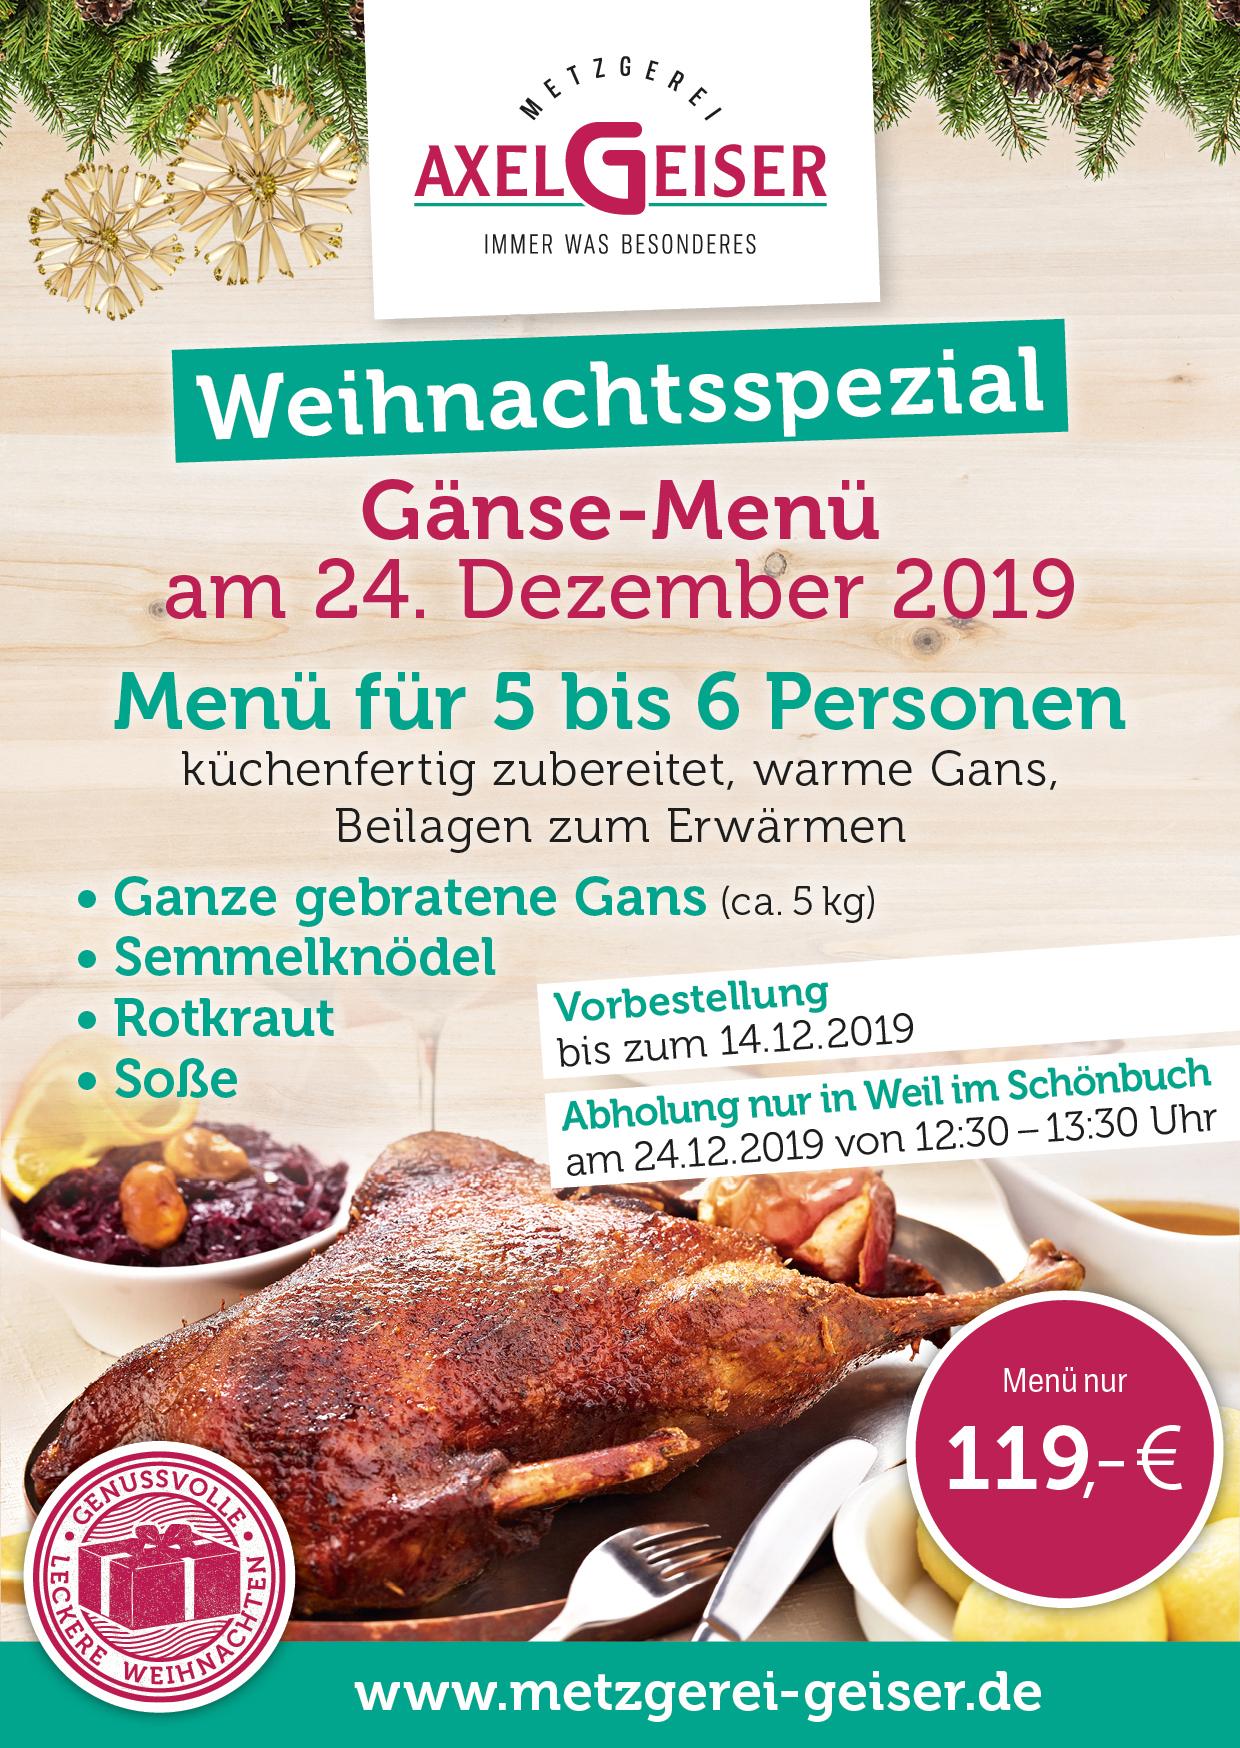 Gänse-Menü am 24.12.